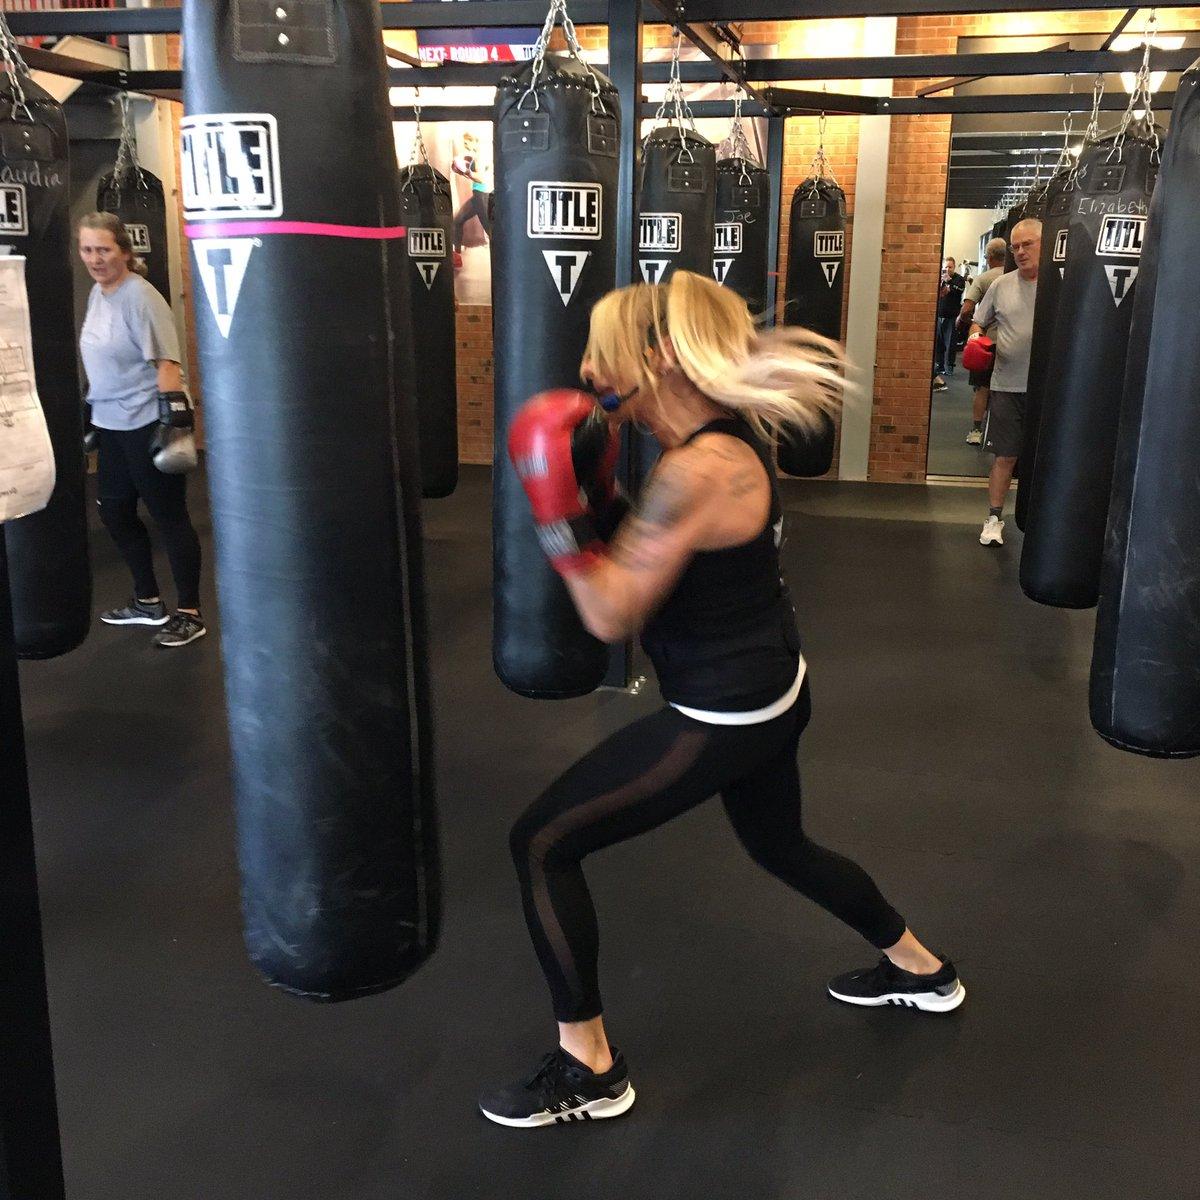 Chelsea, rocking the Friday Noon Class. #Badass #motivation #accountability #results #boxing #mechanicsburg #camphill #kickboxing #getfit